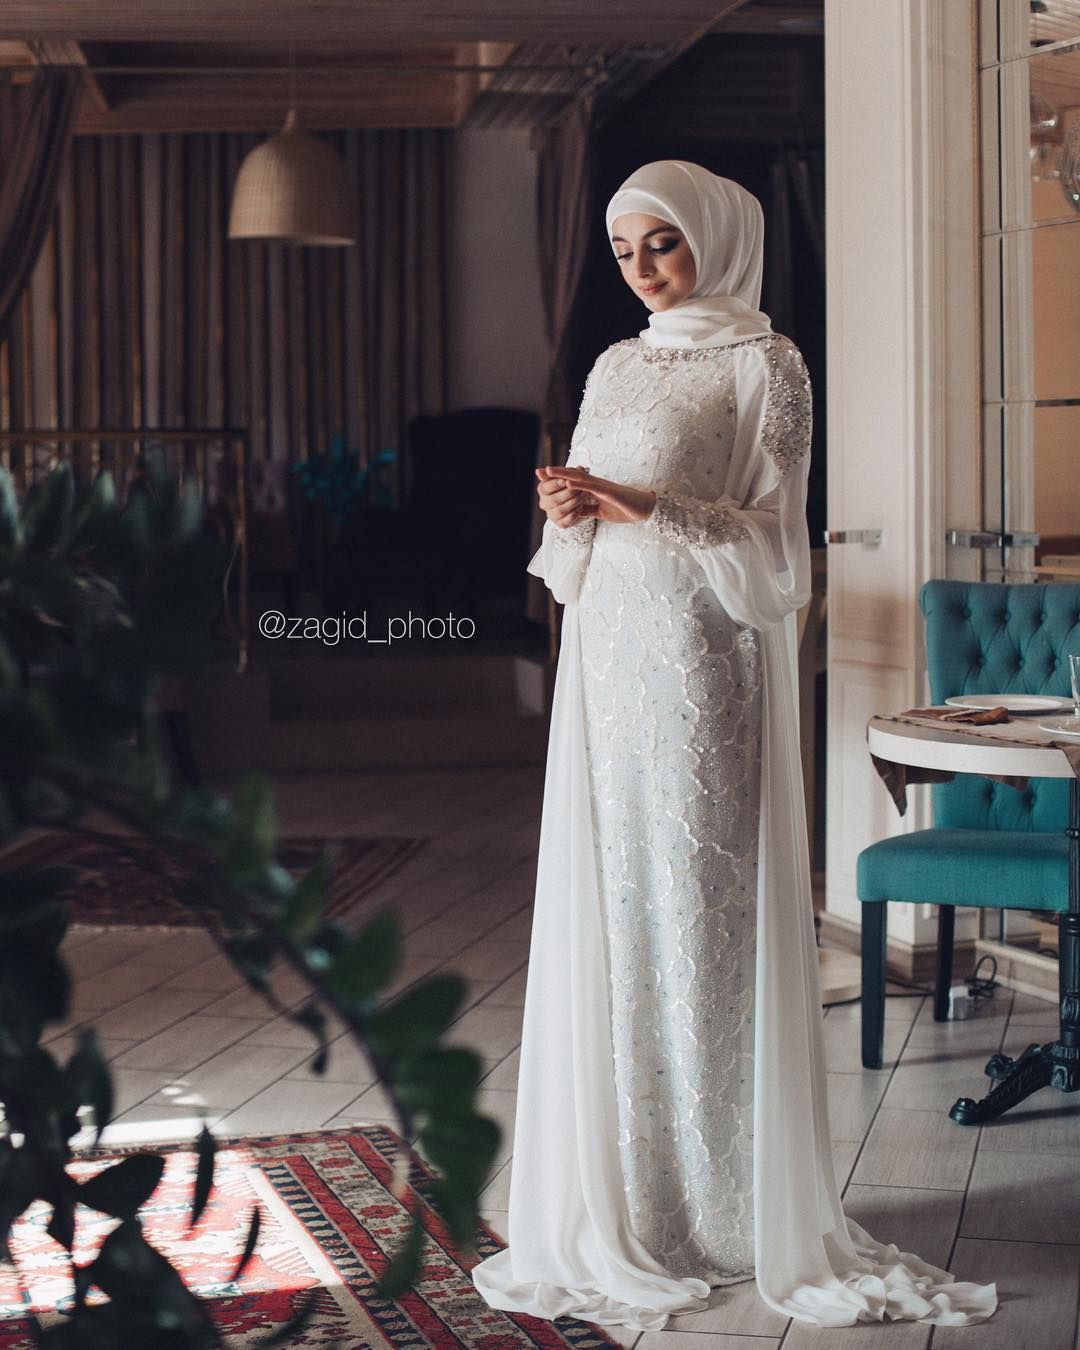 Gaun Pengantin Muslimah Sederhana Unique Pin Oleh СевиРя Бекирова Di Хиджабы Di 2019